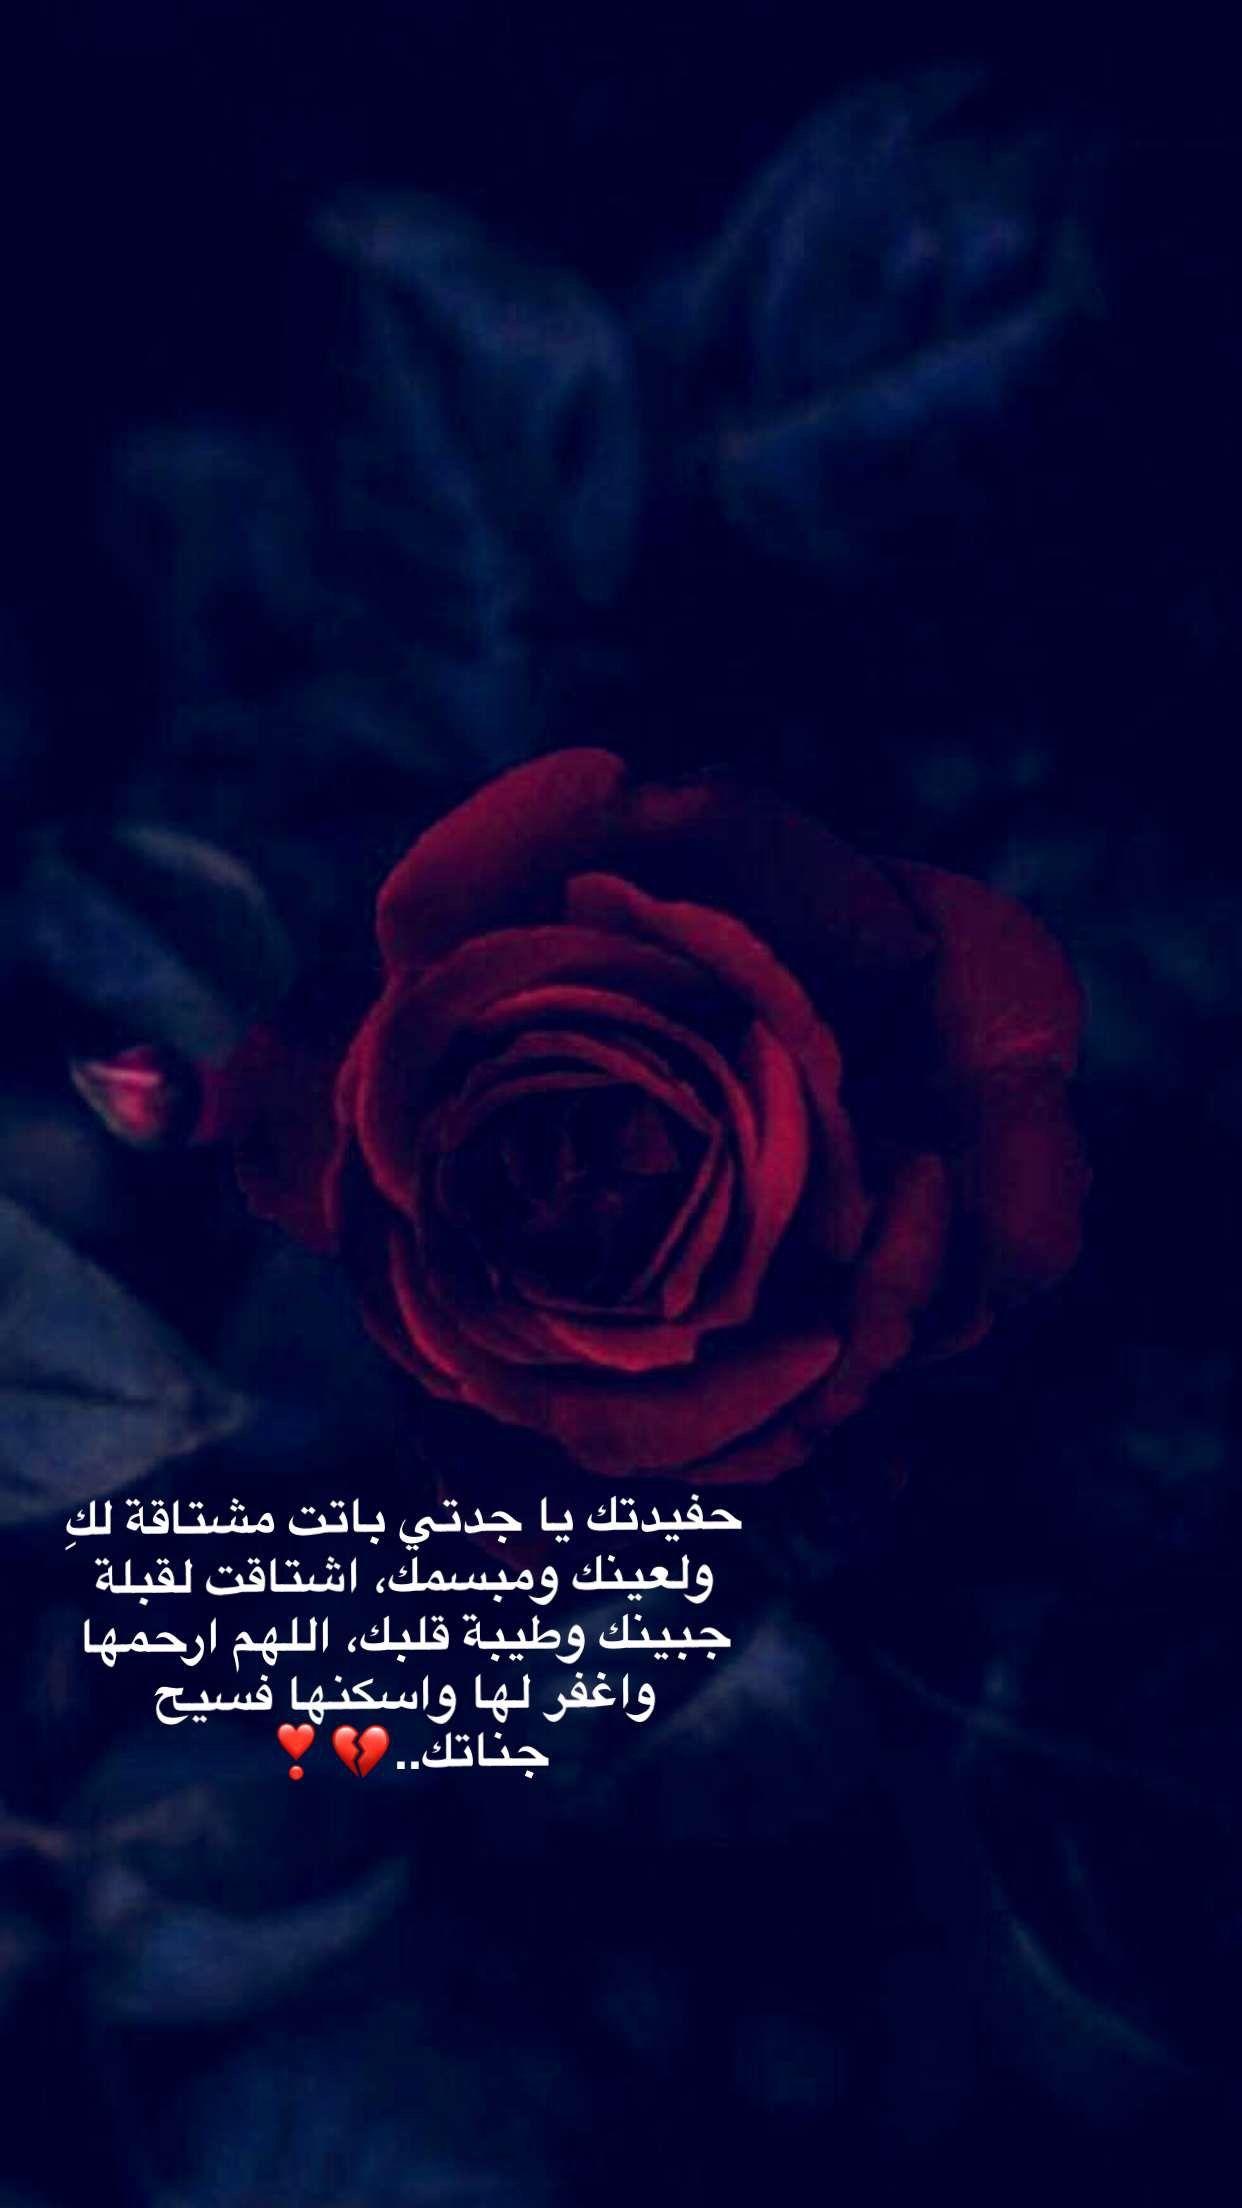 Desertrose جدتي الحبيبة Beautiful Arabic Words Arabic Love Quotes Words Quotes